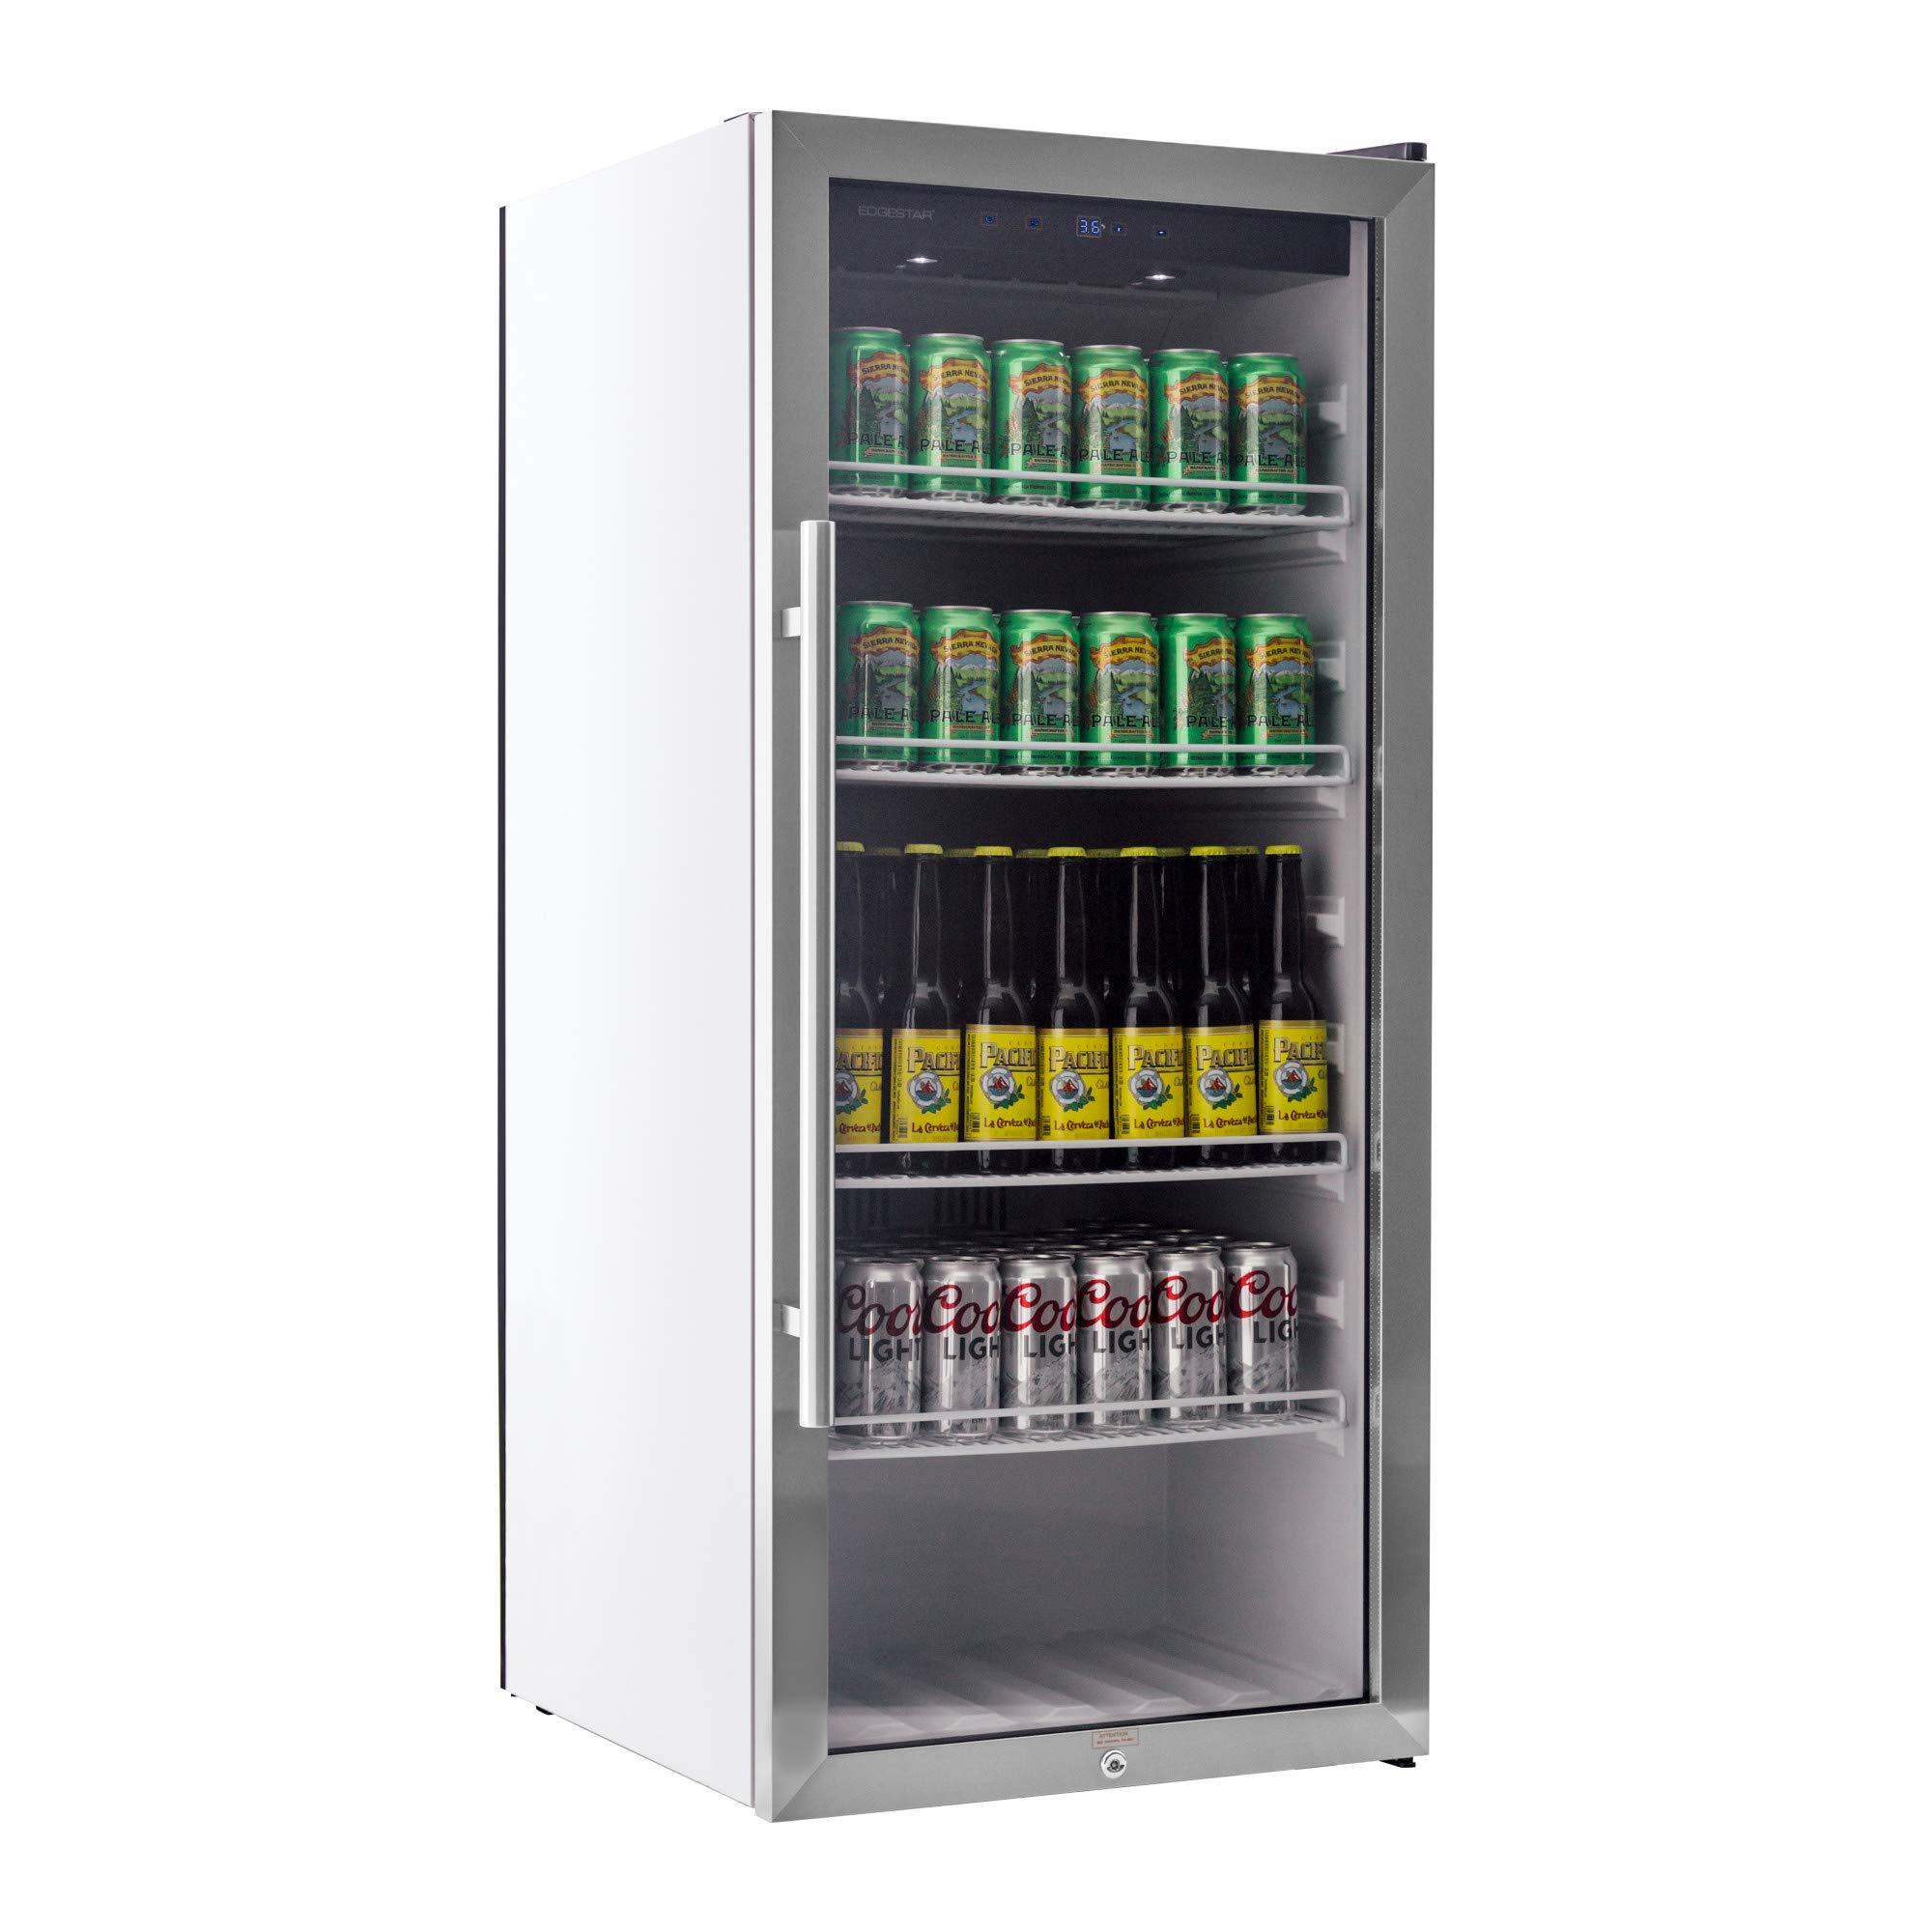 EdgeStar VBR240 Stainless Steel 22 Inch Wide 8.6 Cu. Ft. Commercial Beverage Merchandiser with Temperature Alarm